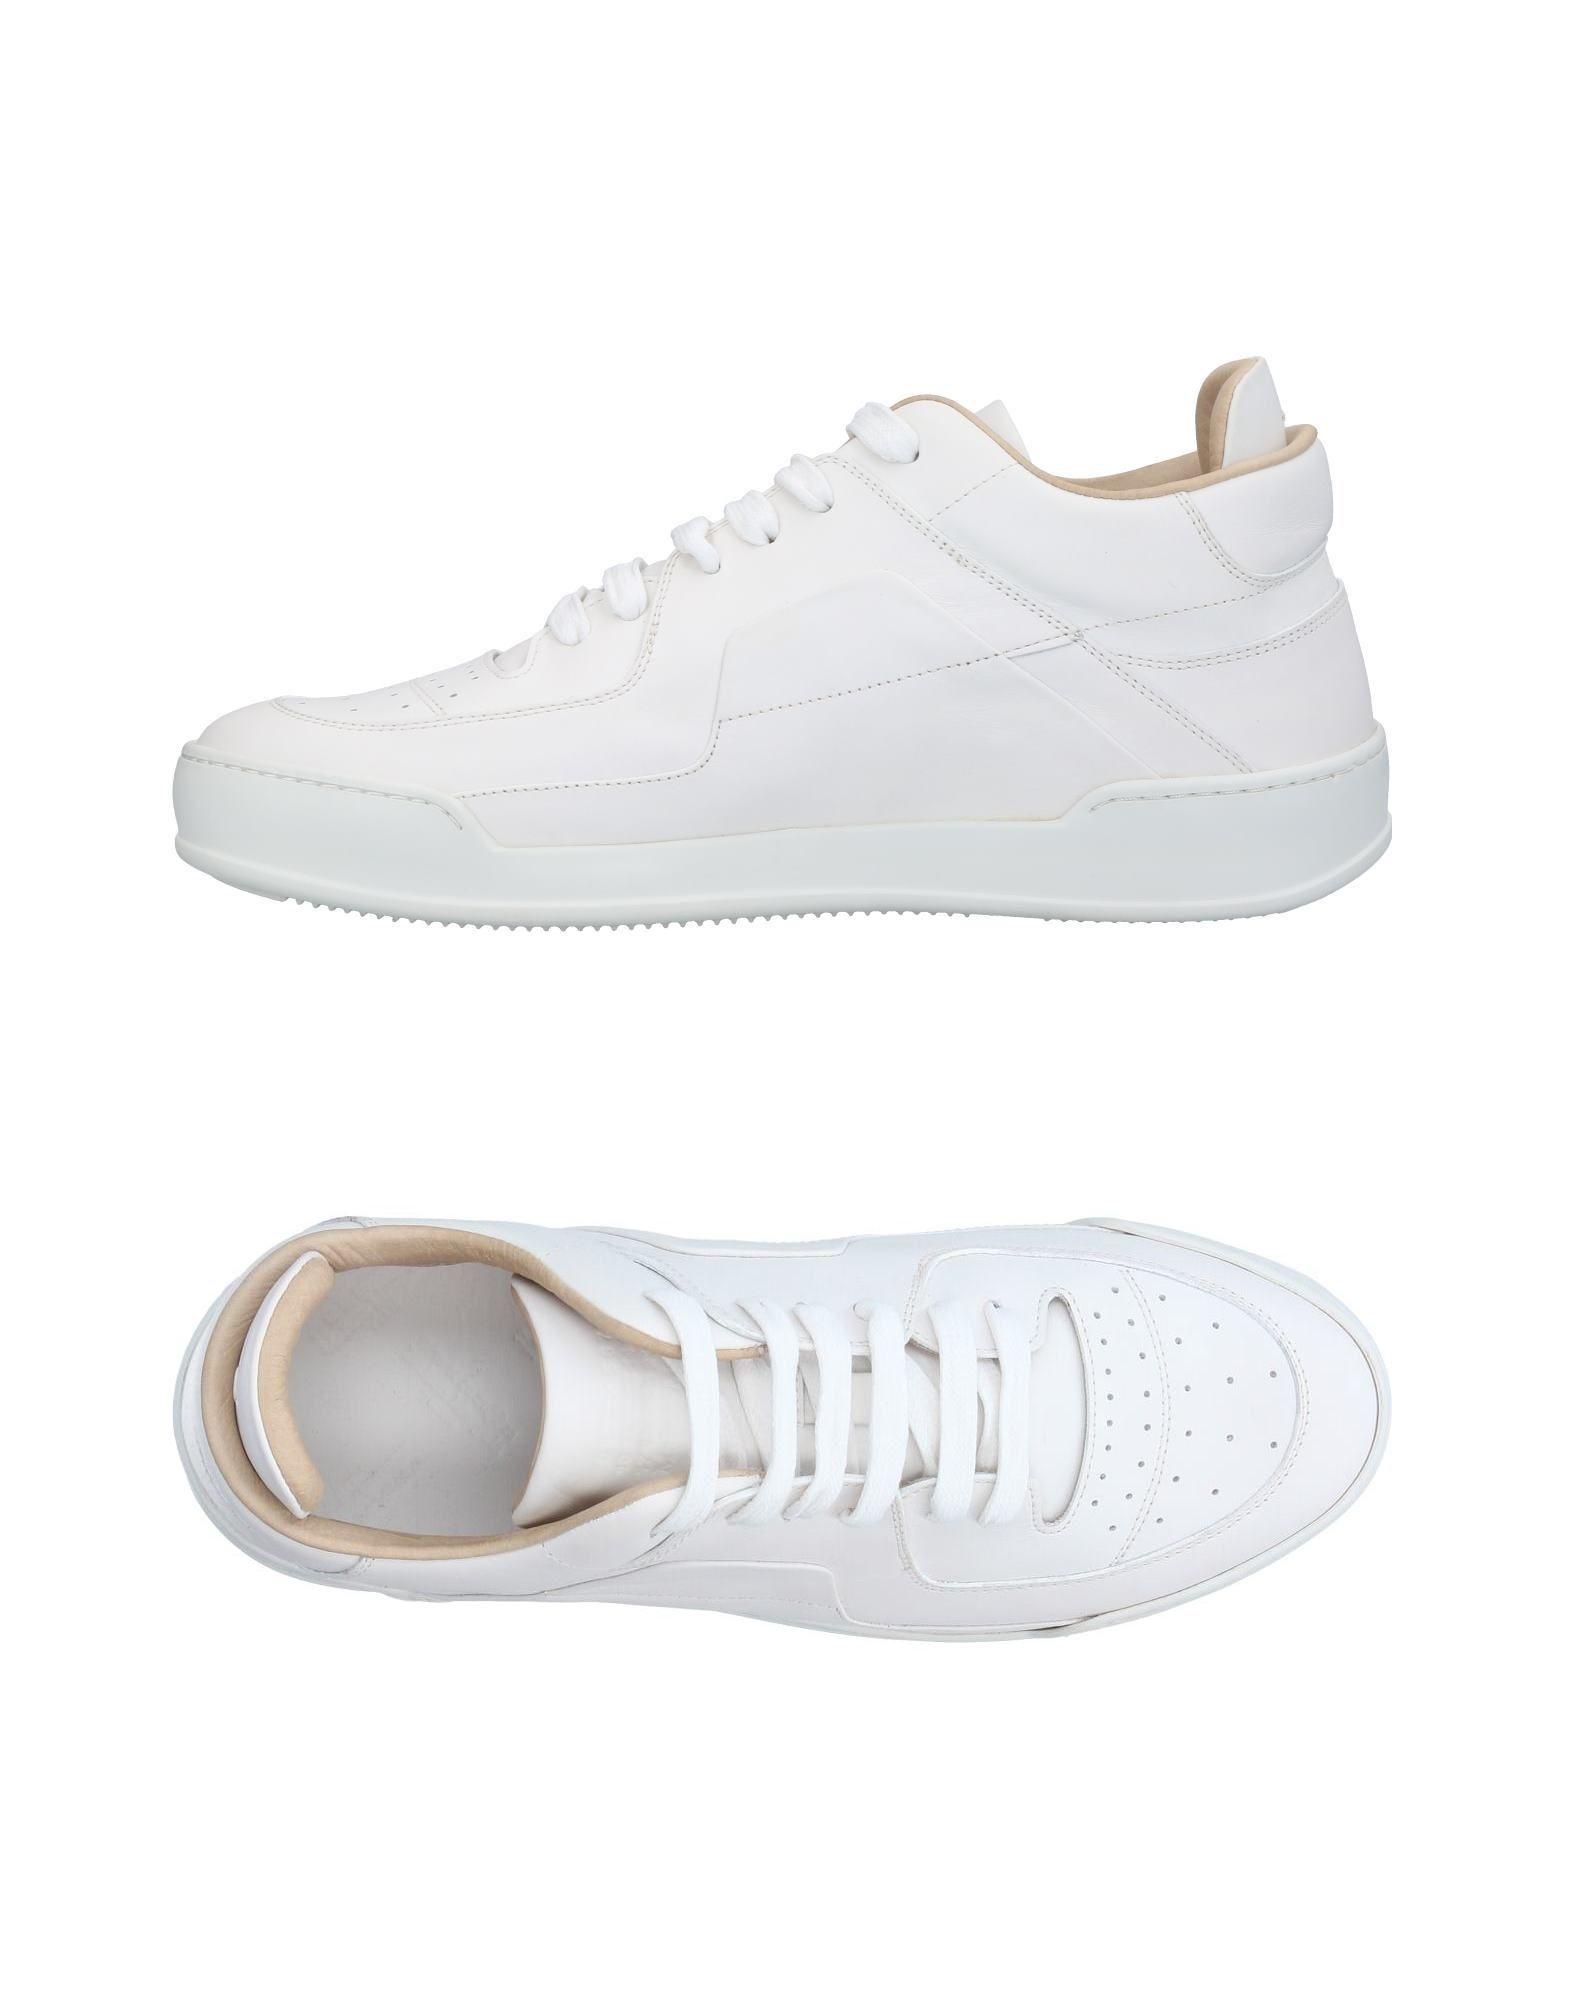 Maison Margiela Sneakers Herren  11341538MK Gute Qualität beliebte Schuhe